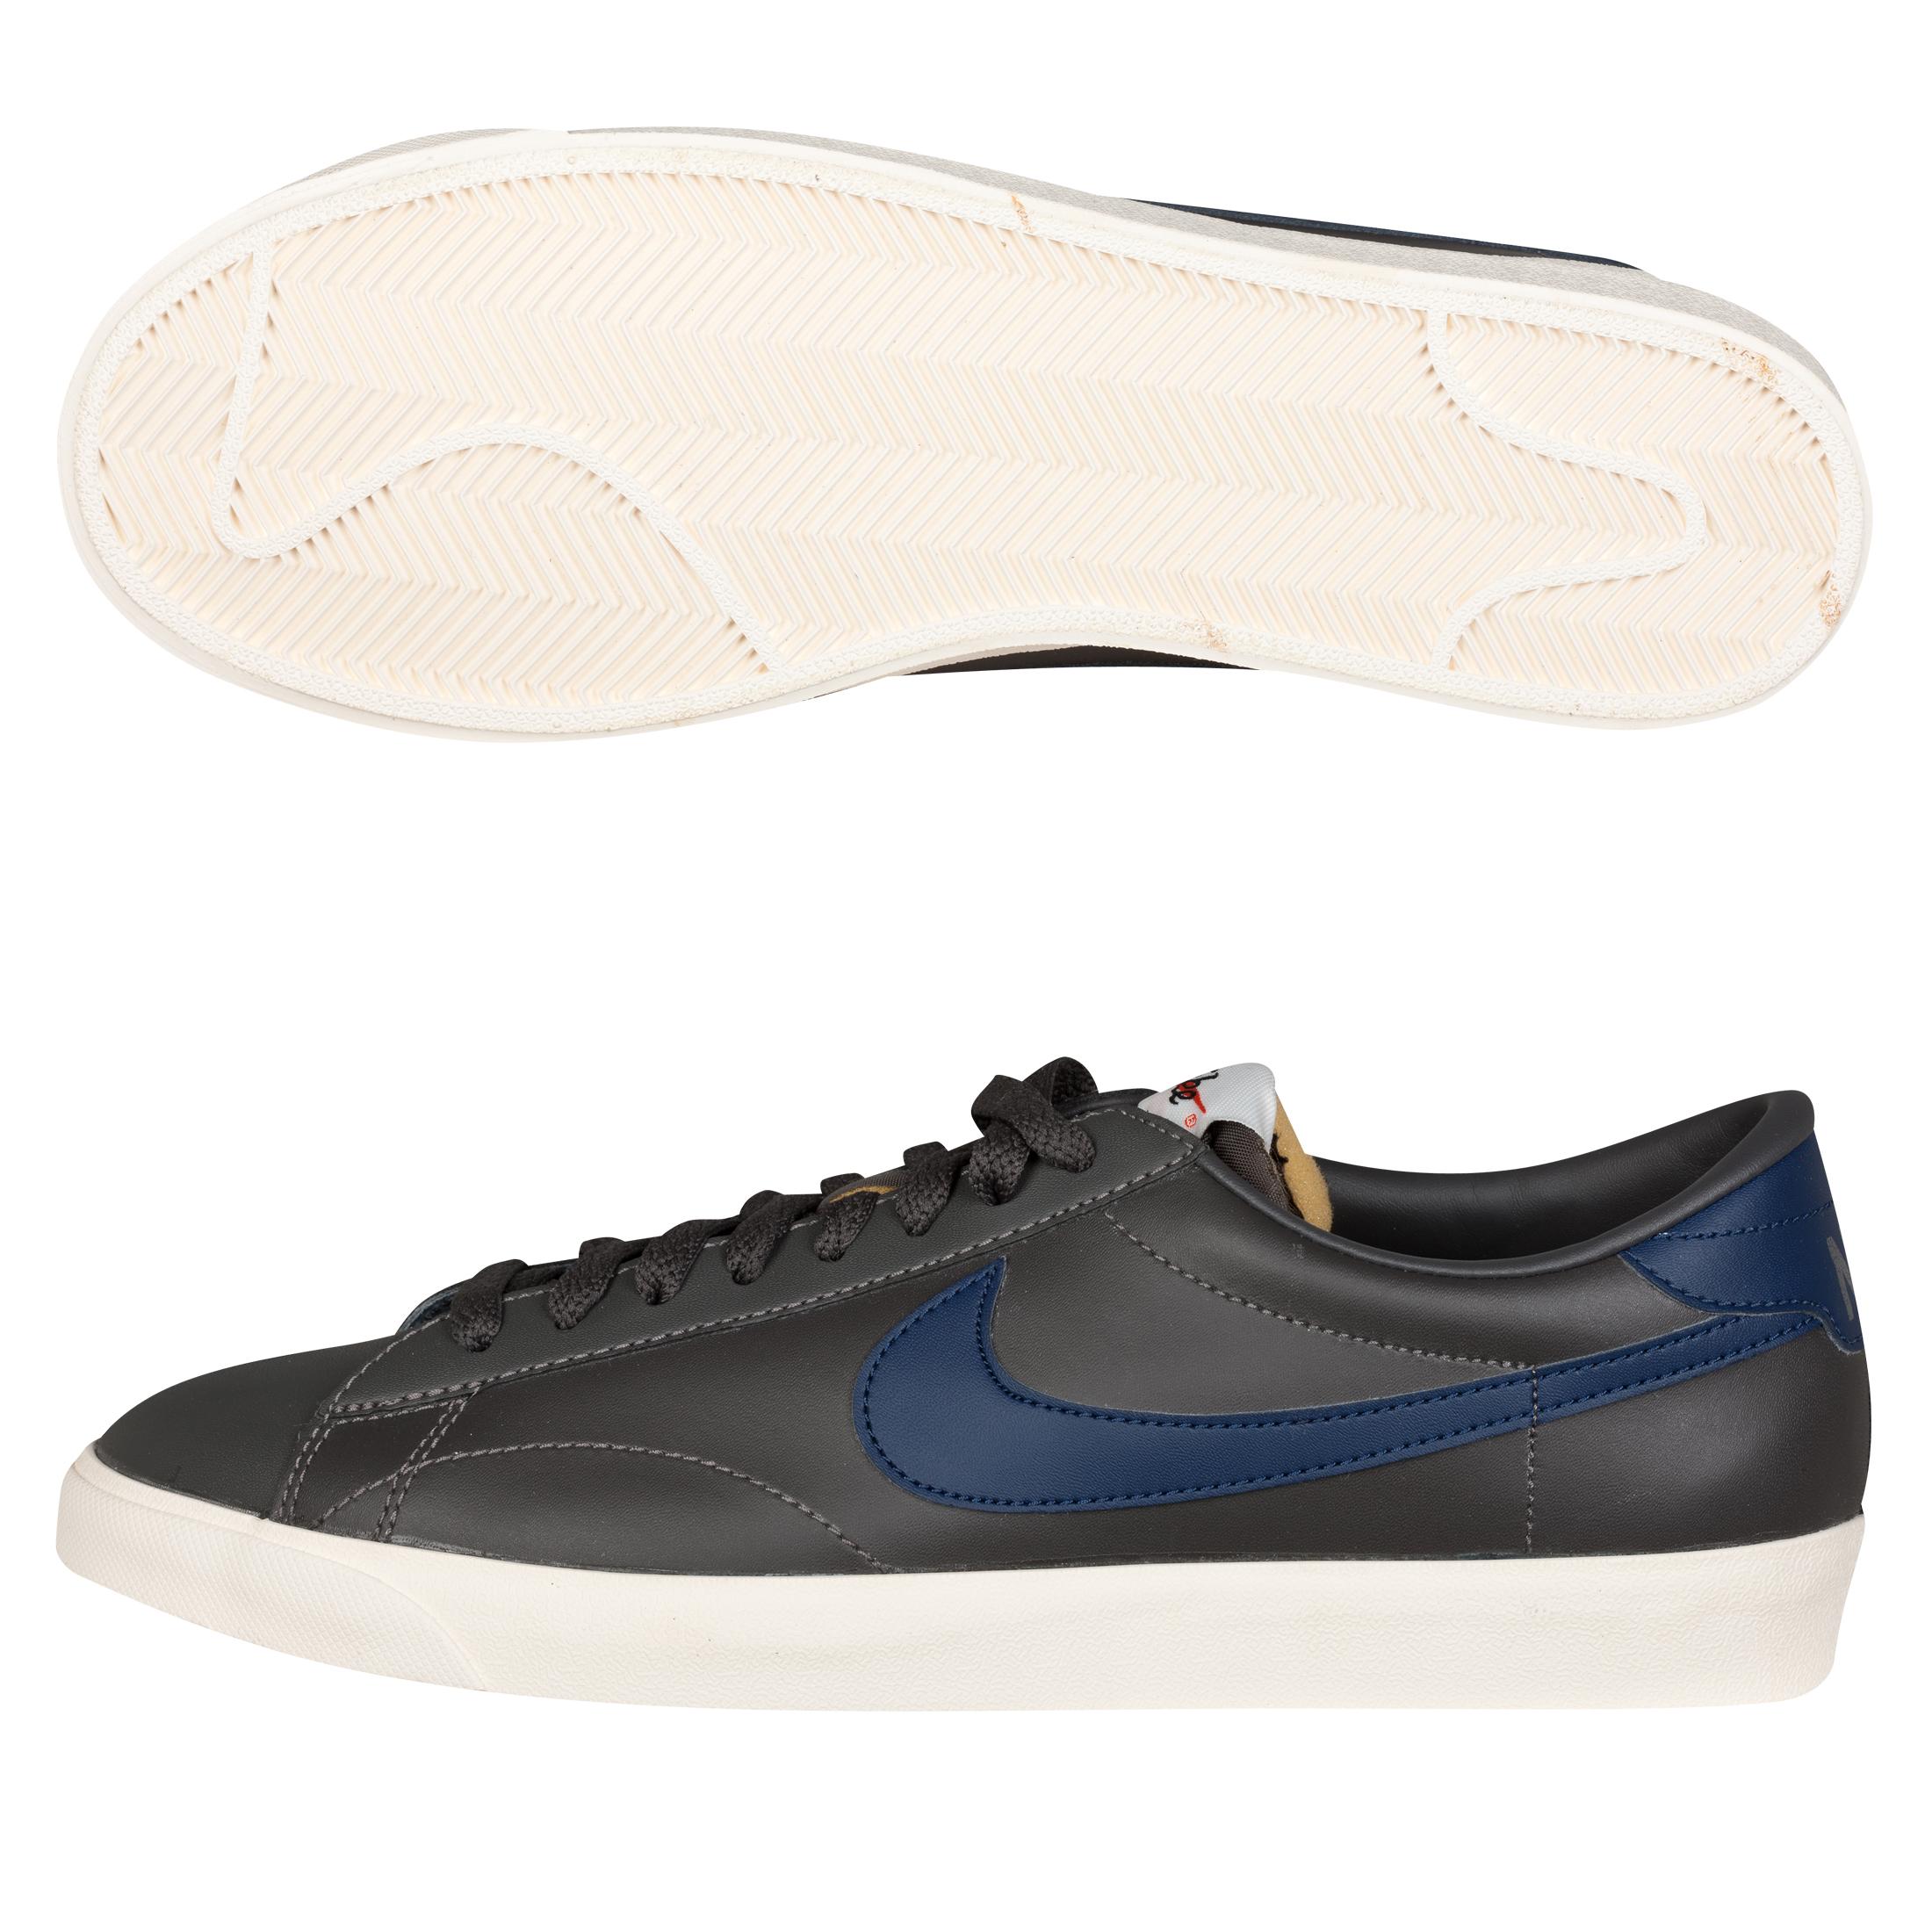 Nike Tennis Classic AC Vintage Trainers - Mid Fog/Mid Navy